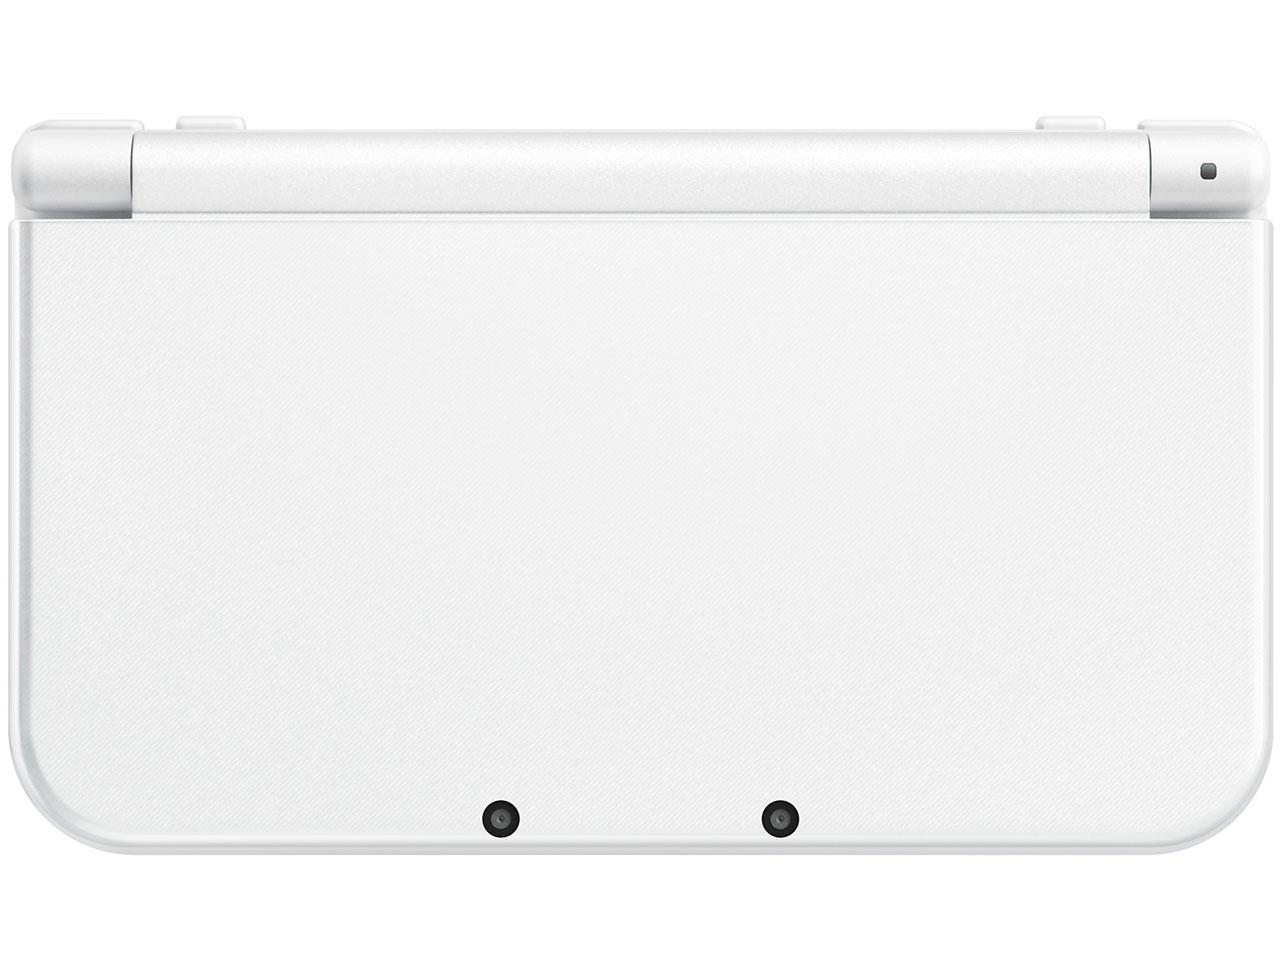 Newニンテンドー3DS LL パールホワイト の製品画像